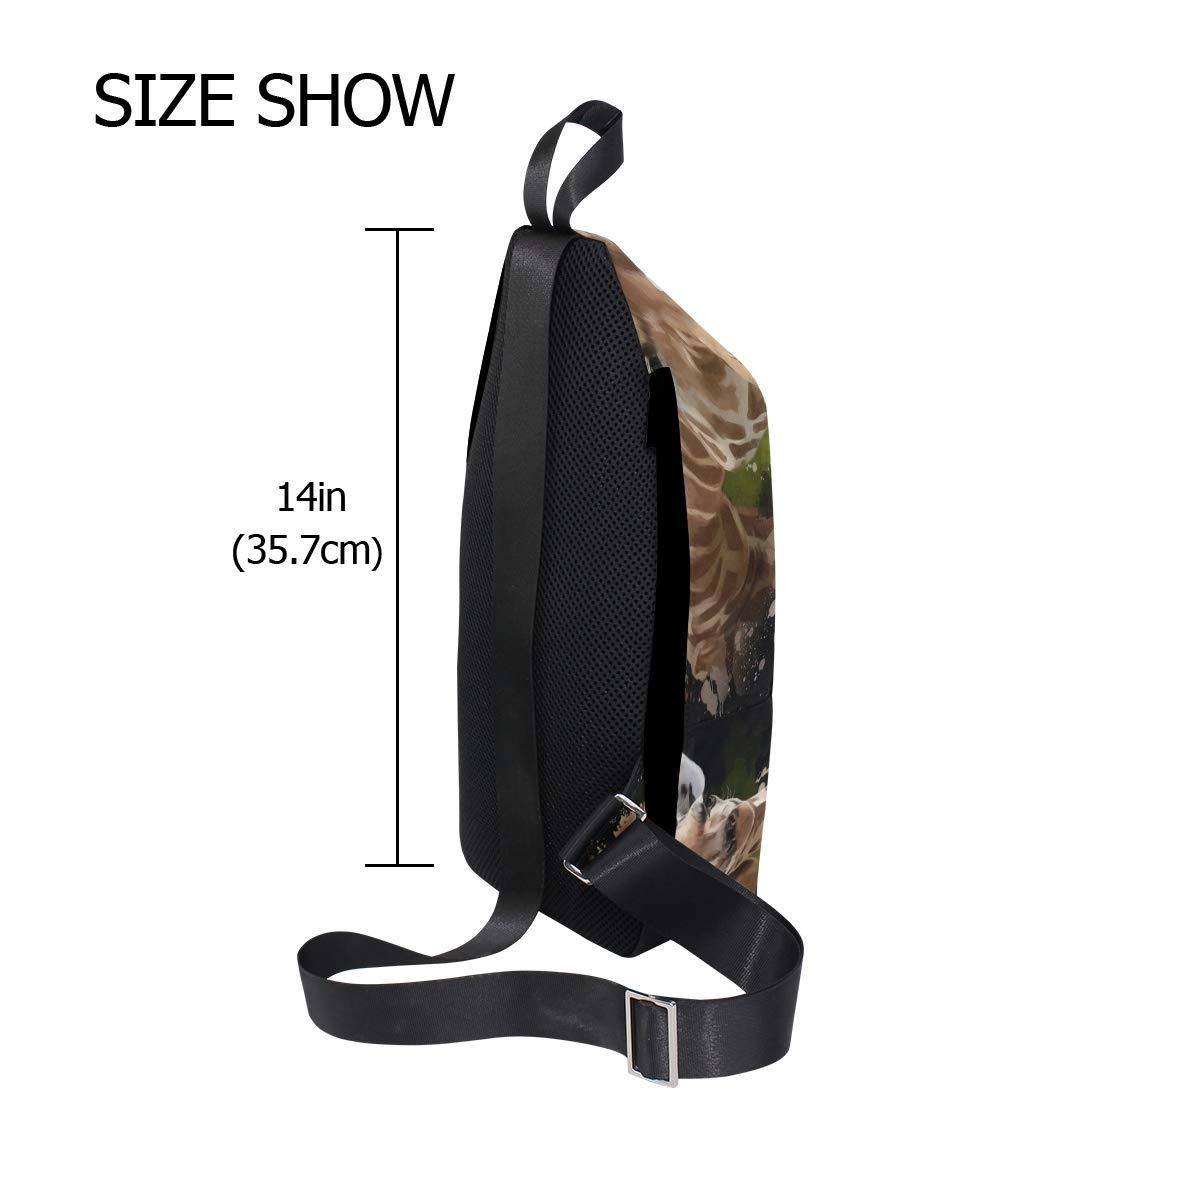 TFONE Animal Giraffe Pattern Crossbody Bag Lightweight Chest Shoulder Messenger Pack Backpack Sling Bag